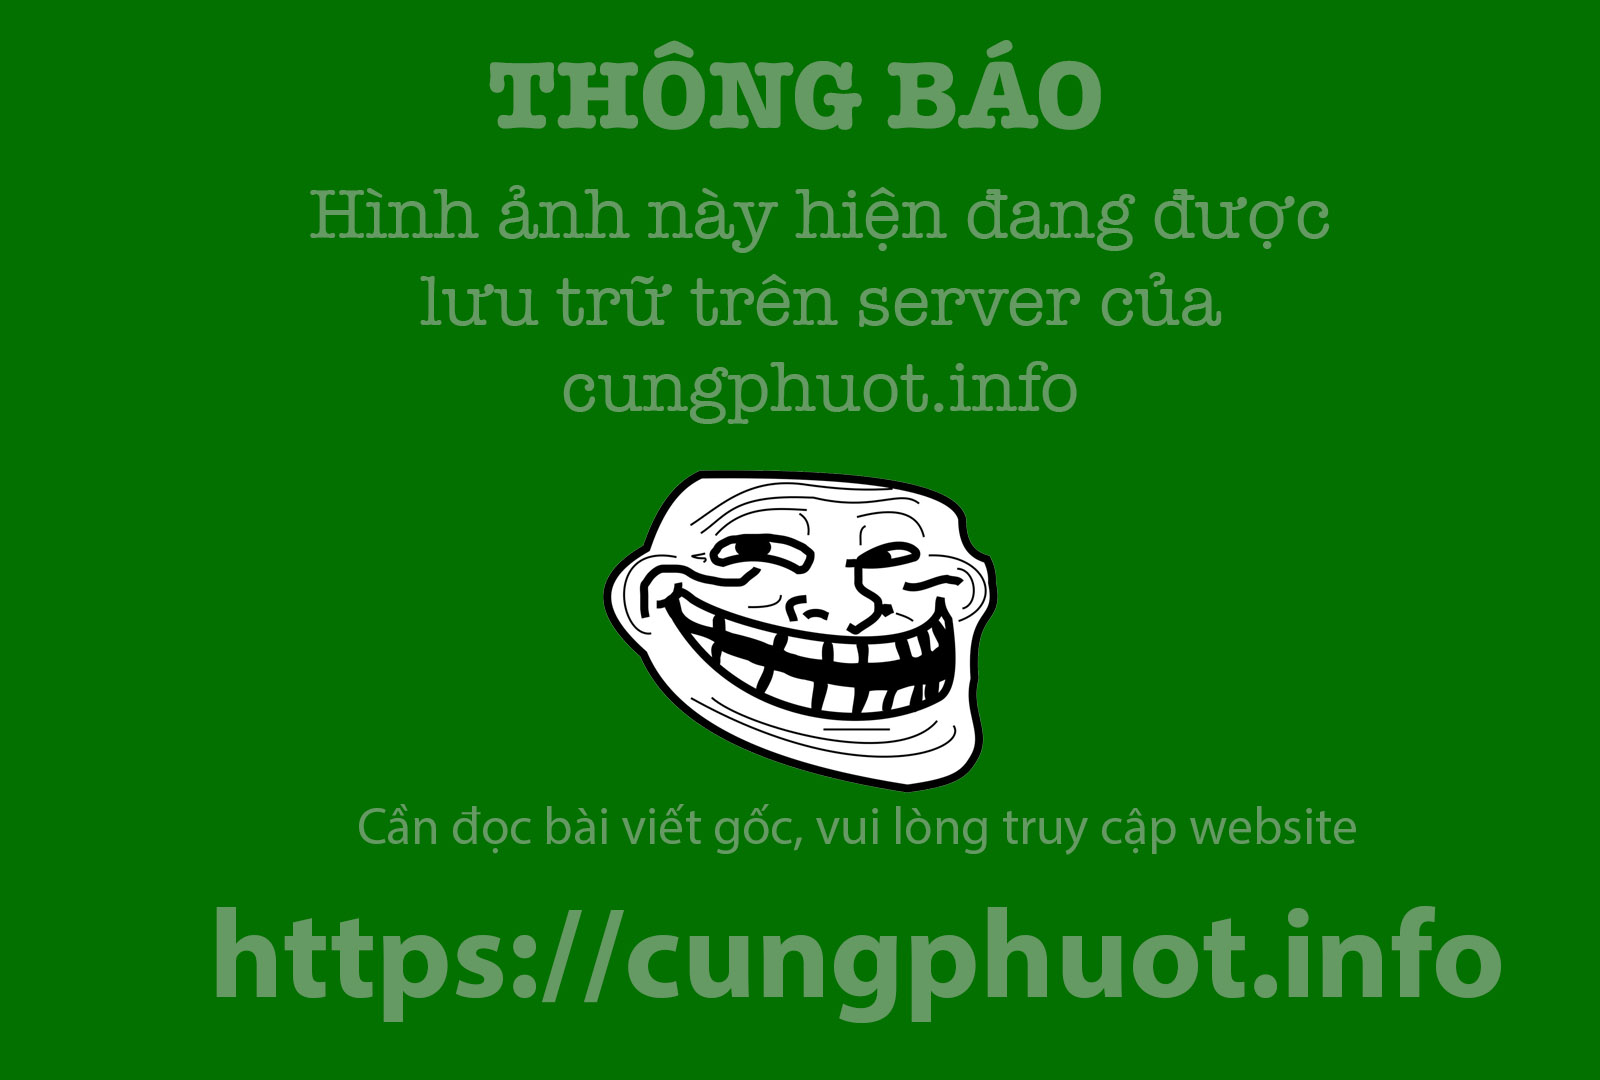 Ảnh: Nguyễn Hồng Minh